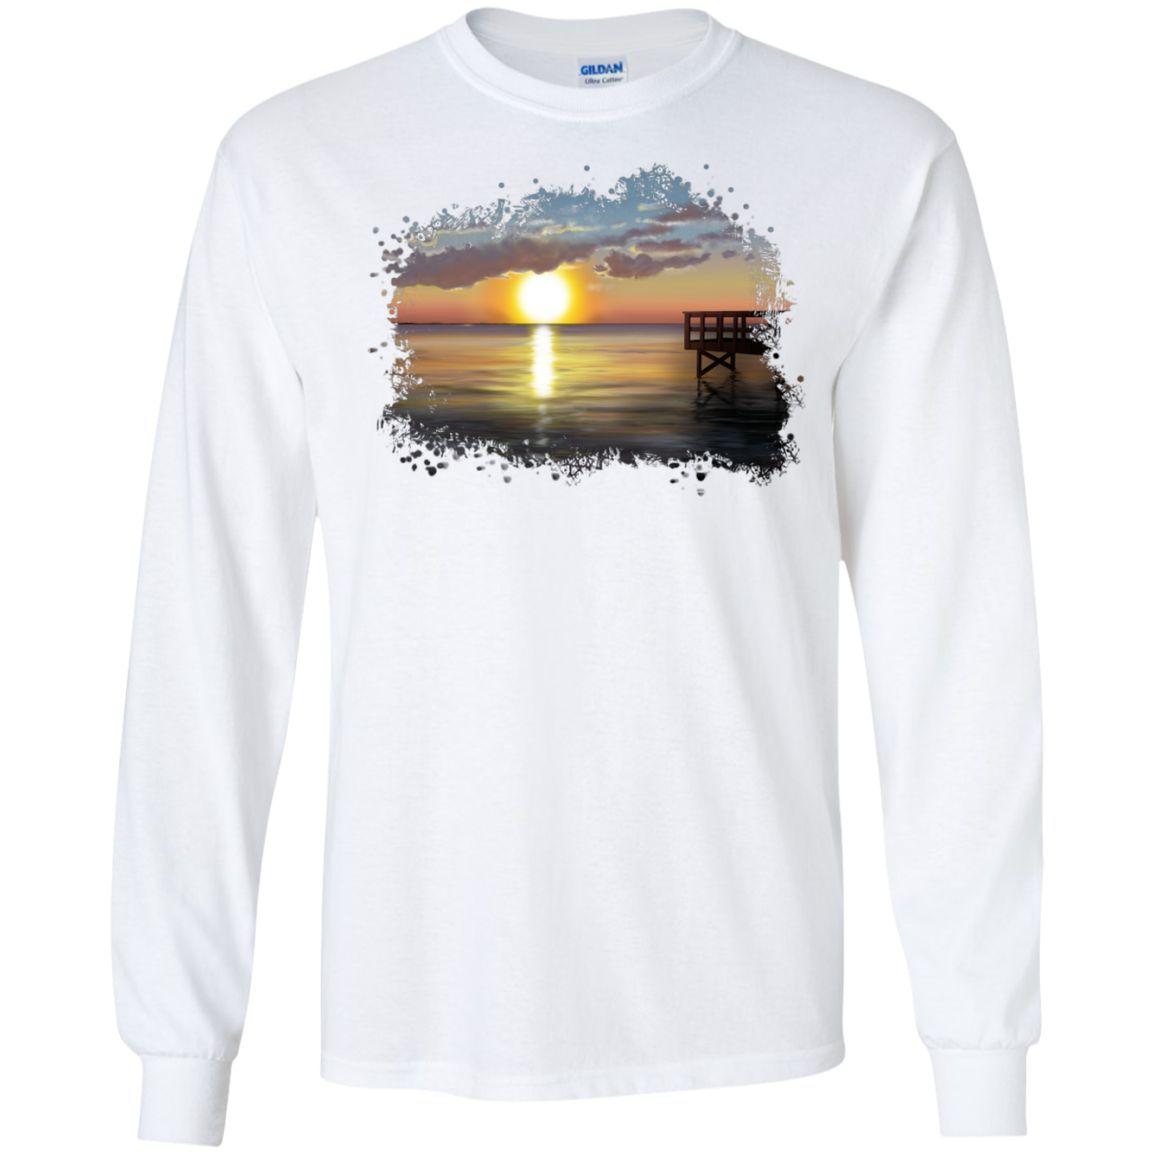 MBIT - Dock at Sunset * LS Ultra Cotton Tshirt